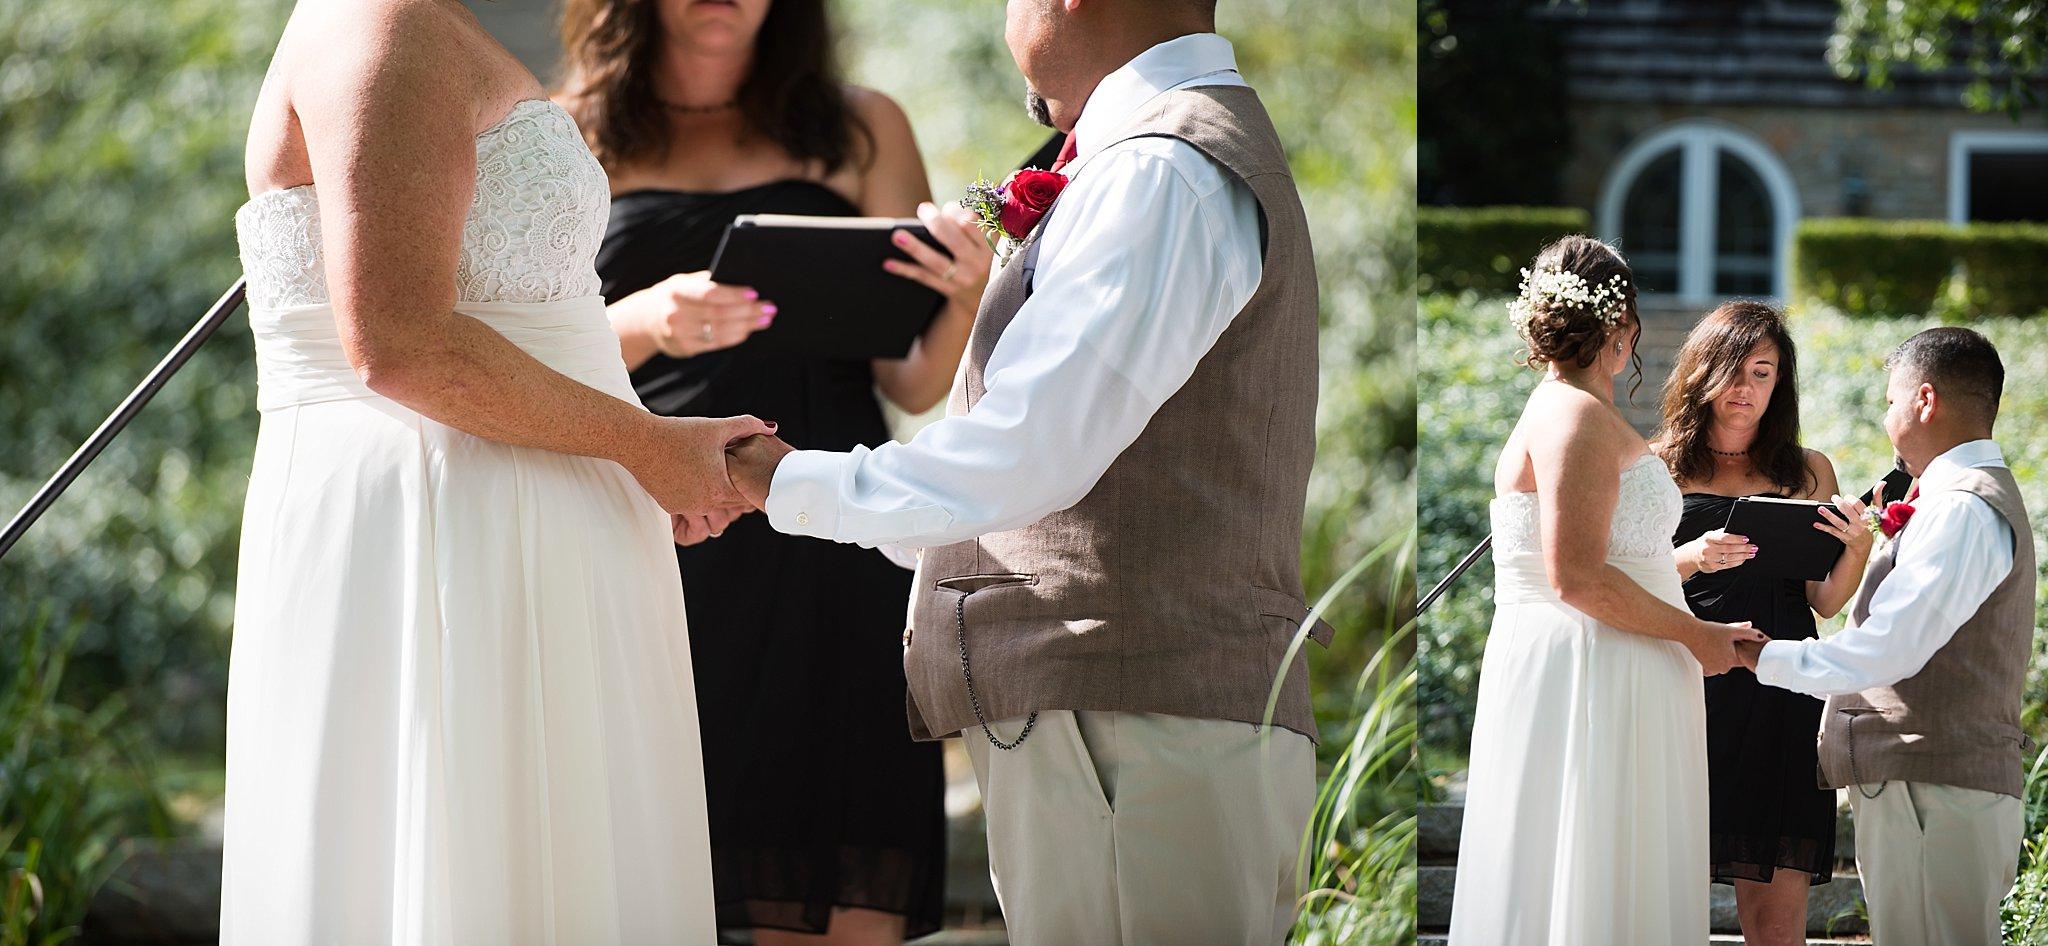 rustic wedding locations in massachusetts.jpg